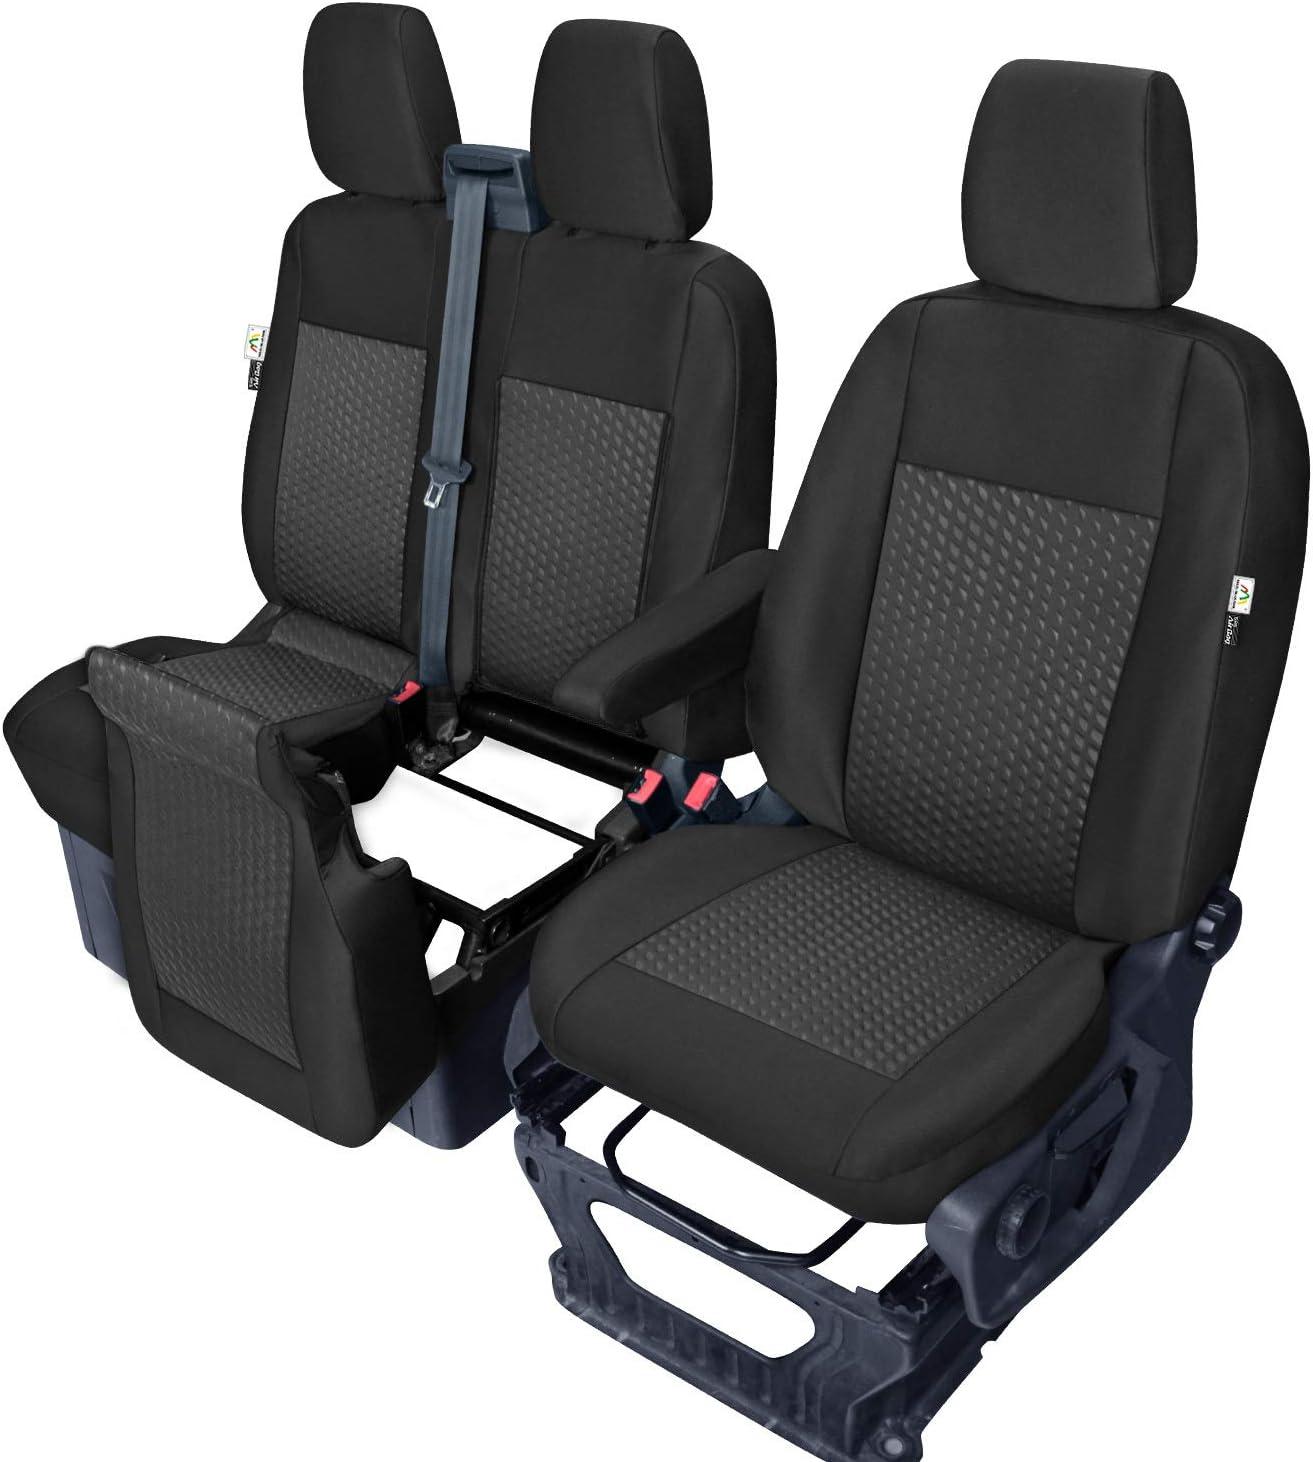 Sitzbezüge Tailor Made Passgenau Kompatibel Mit Ford Transit Ab 2014 Und Ab 2019 Stoffbezüge Neuheit Auto